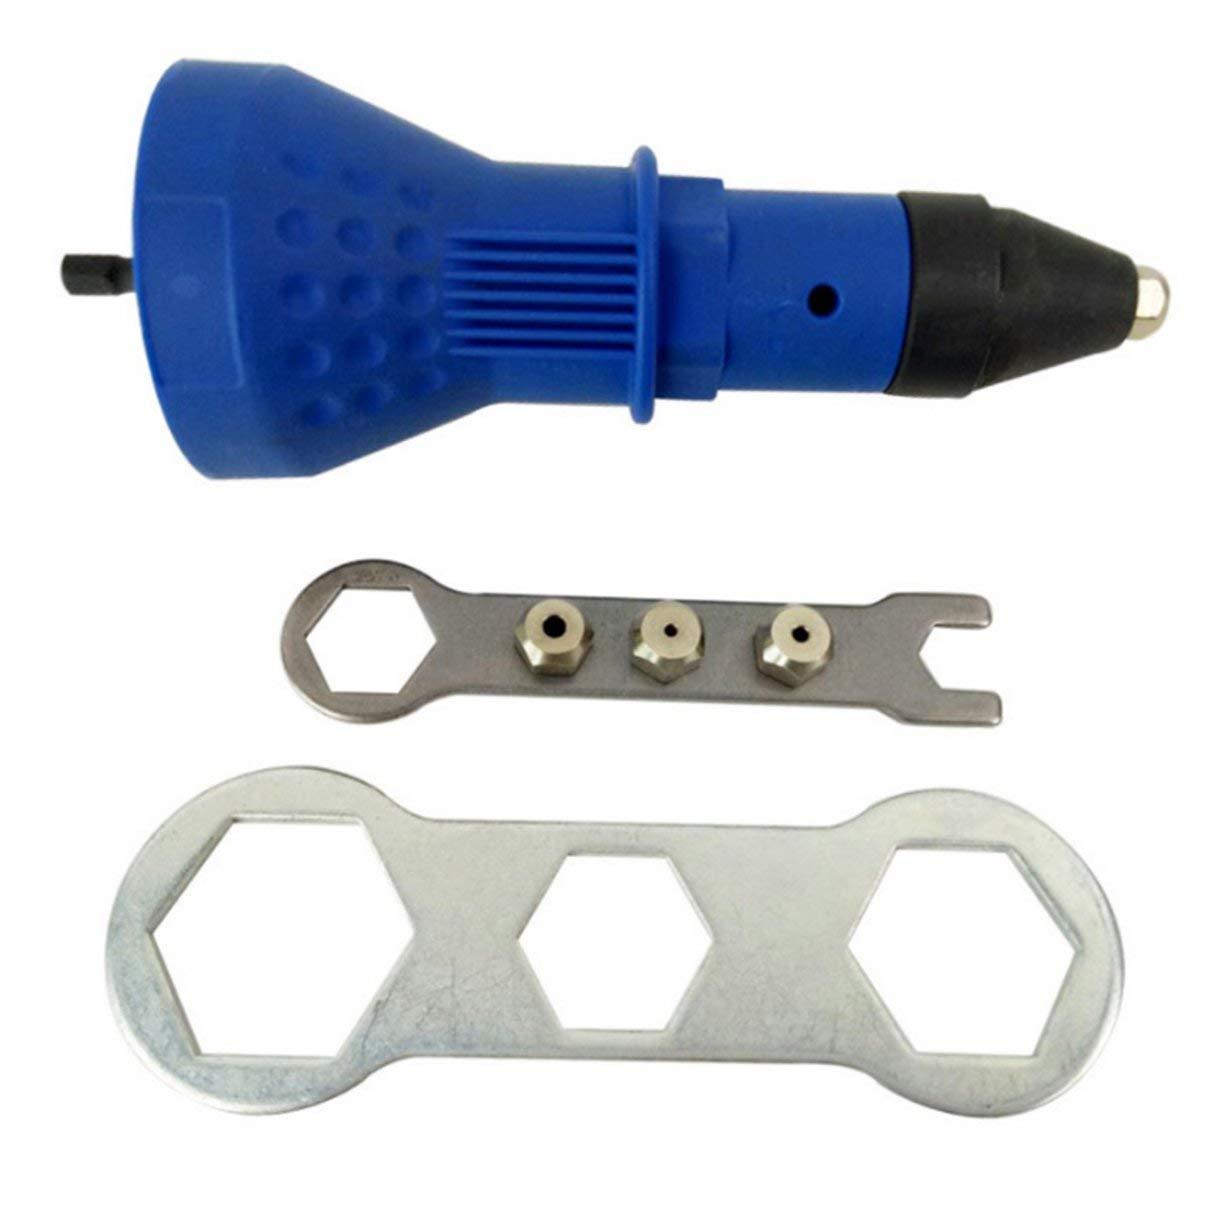 Detectoy Riveter Gun Rivet Tool Kit, Electric Rivet Nut Gun Drill Adapter Kit Riveting Tool, Cordless Riveting Insert Nut Power Tool, Professional Rivet Gun Kit Hand Tool Accessories